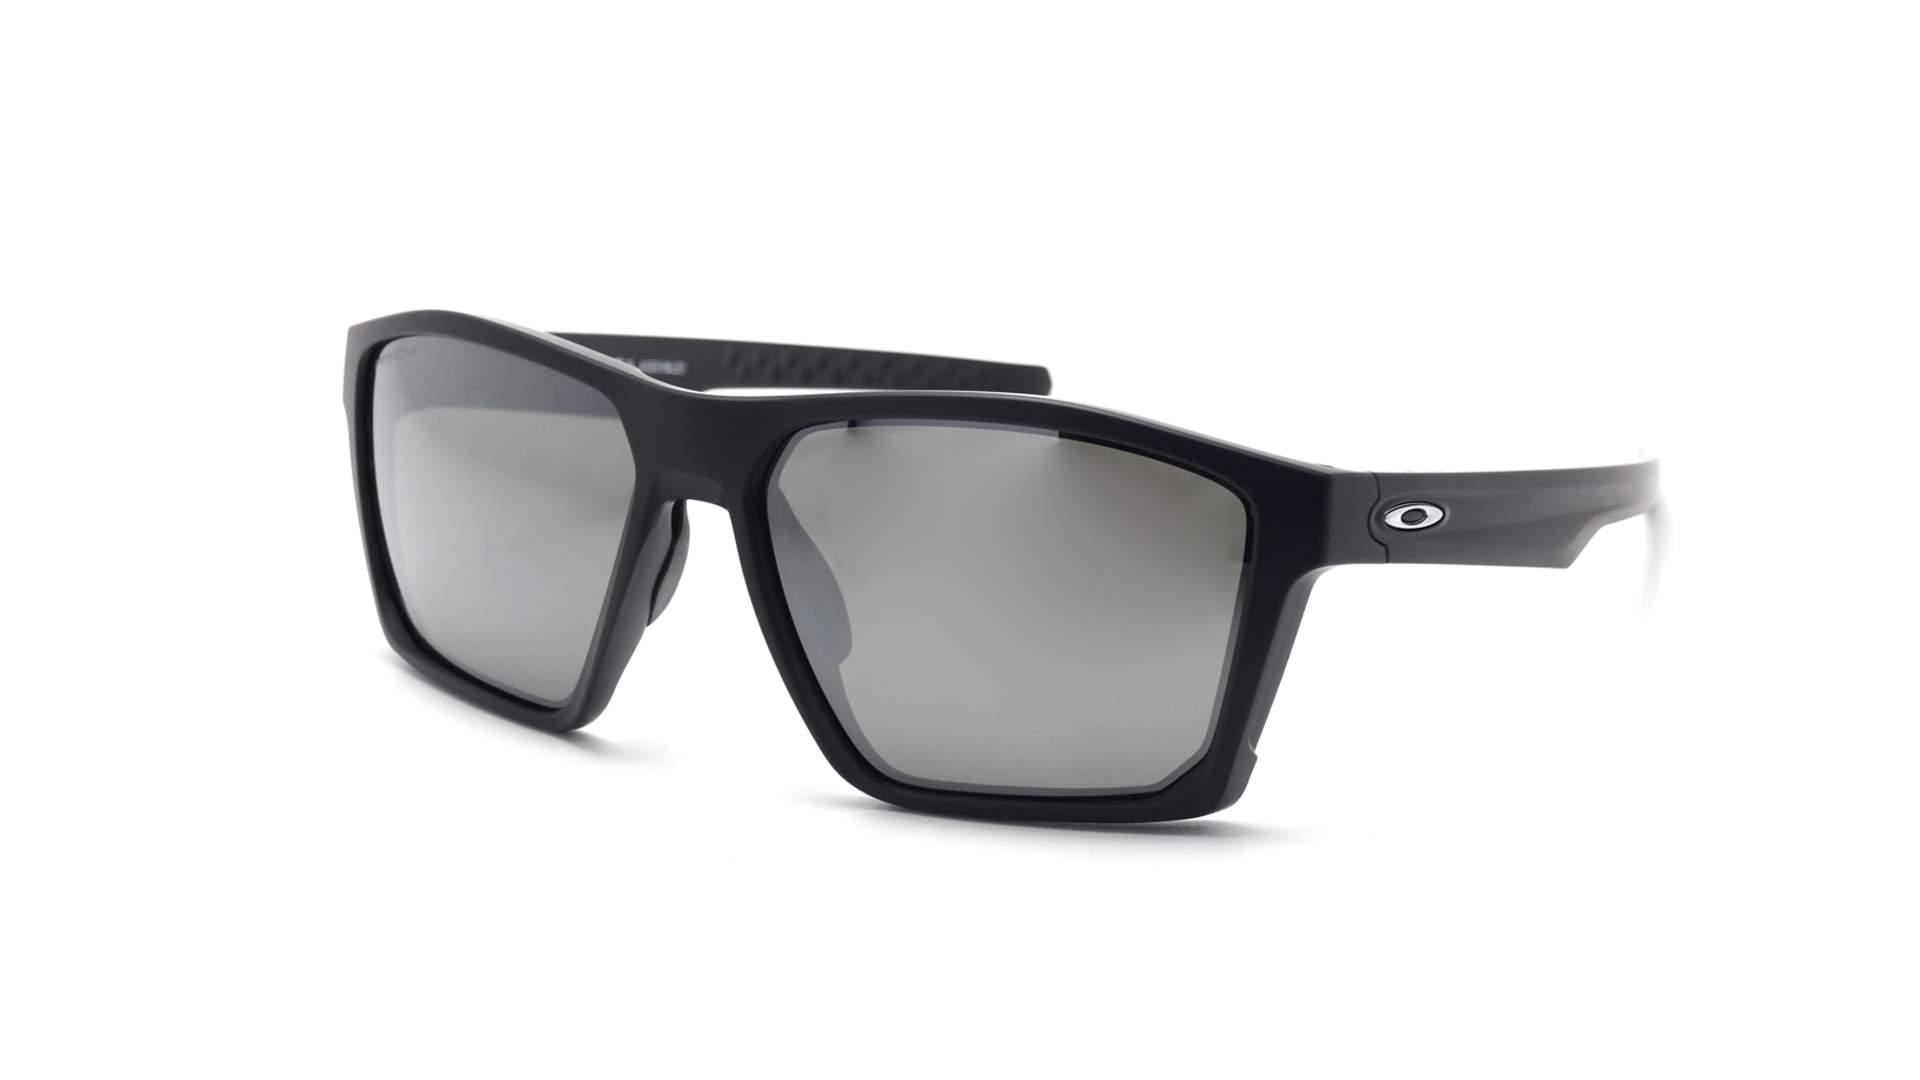 841224d531 Sunglasses Oakley Targetline Matte black Black Matte Prizm OO9397 02 58-16  Medium Mirror